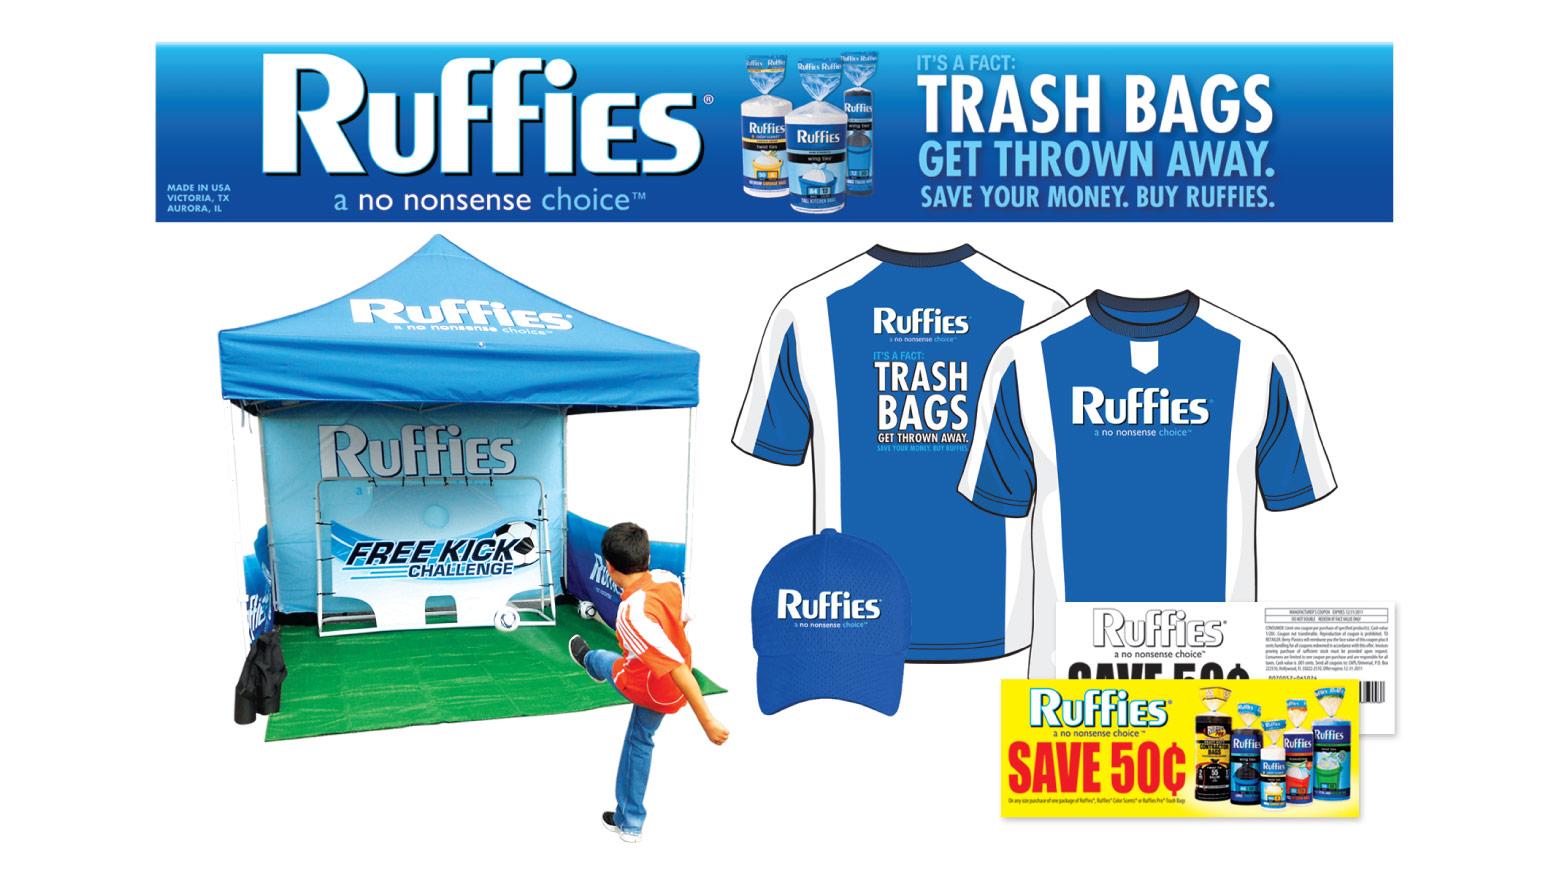 Ruffies - Event Marketing - Trash Bag Sponsorship